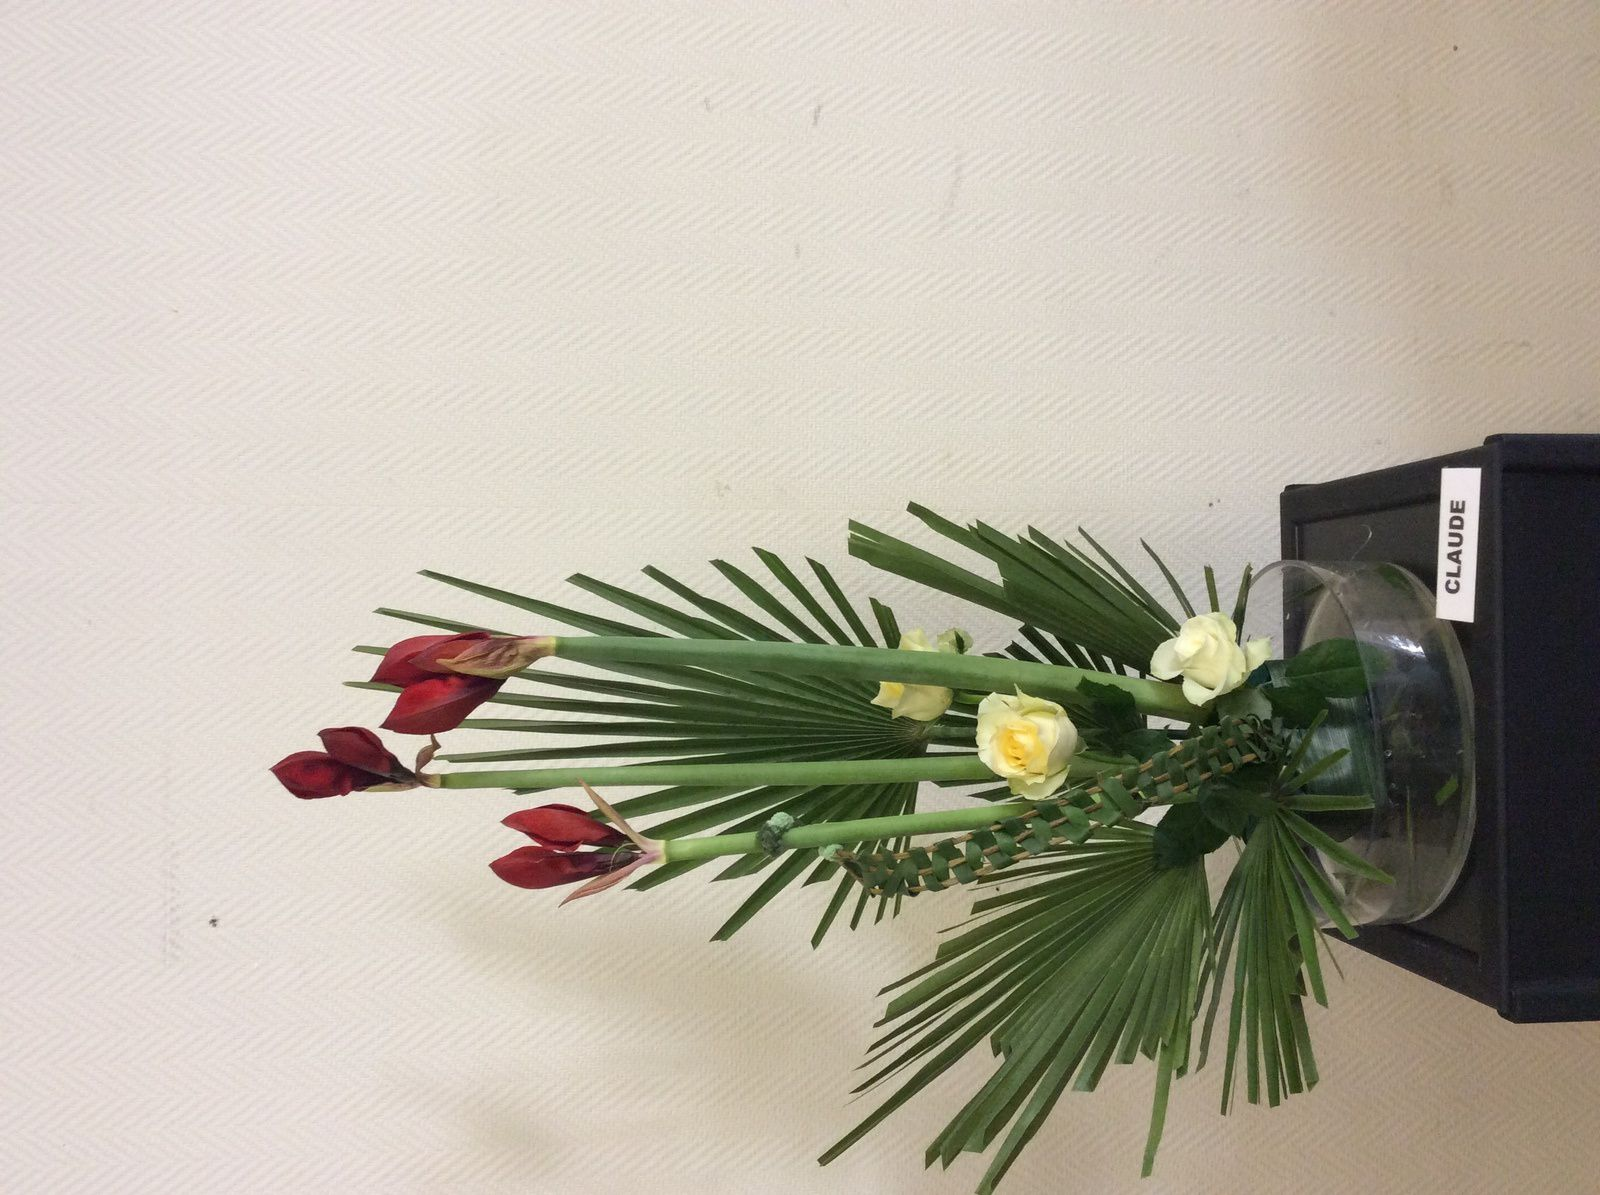 Amaryllis, Chamerops, Roses, Typa, Flexi grass, piments.